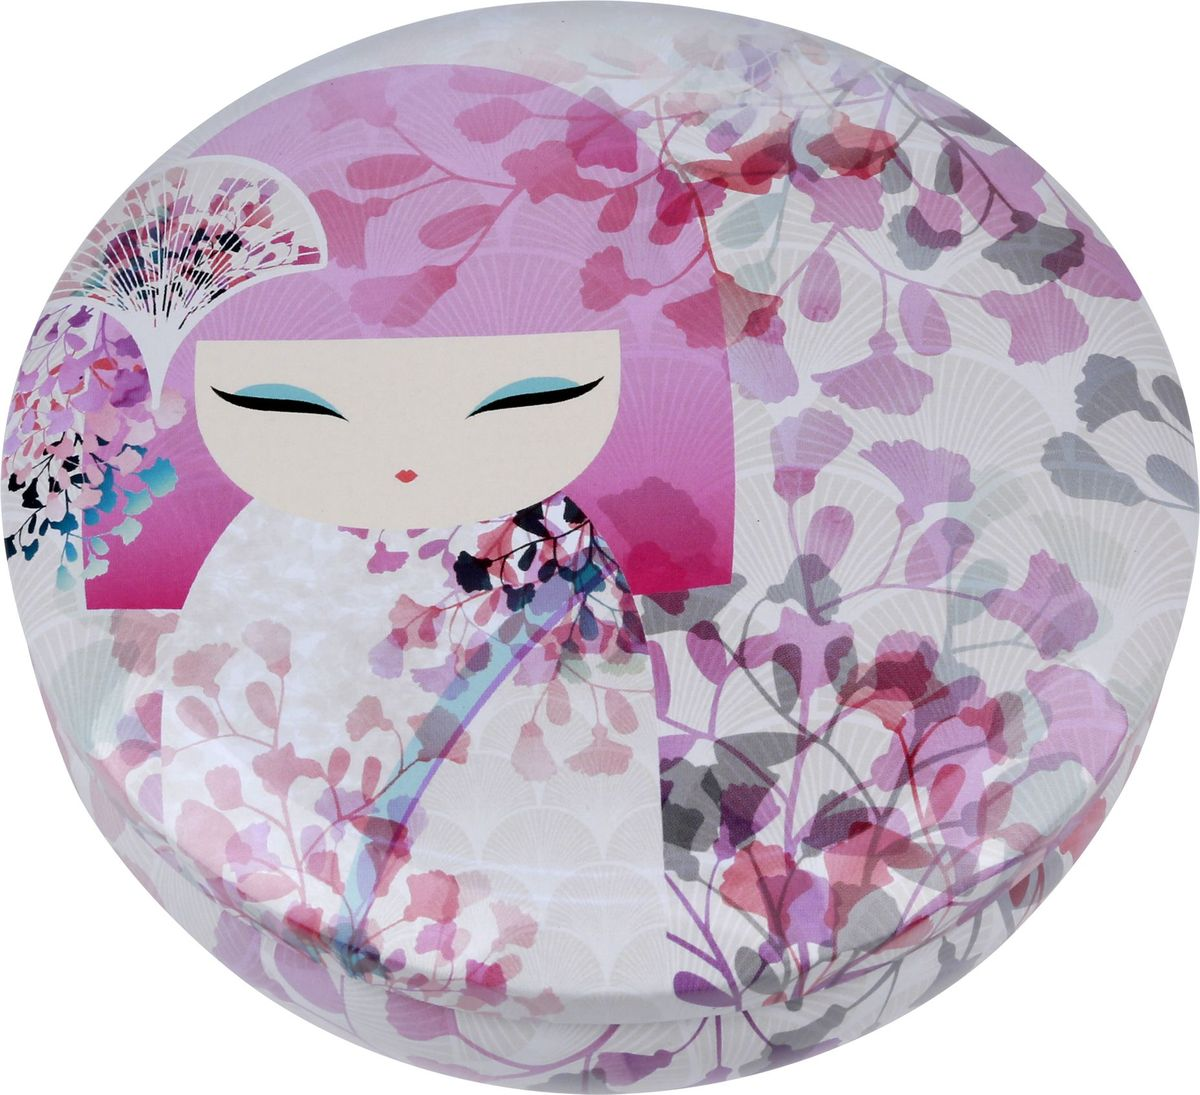 Жестяная шкатулка Kimmidoll Макото. KH098543718Милая жестяная шкатулка для хранения бижутерии или косметики.Материал: жестьРазмер: 13,5 x 4,5 x 13,5 см.